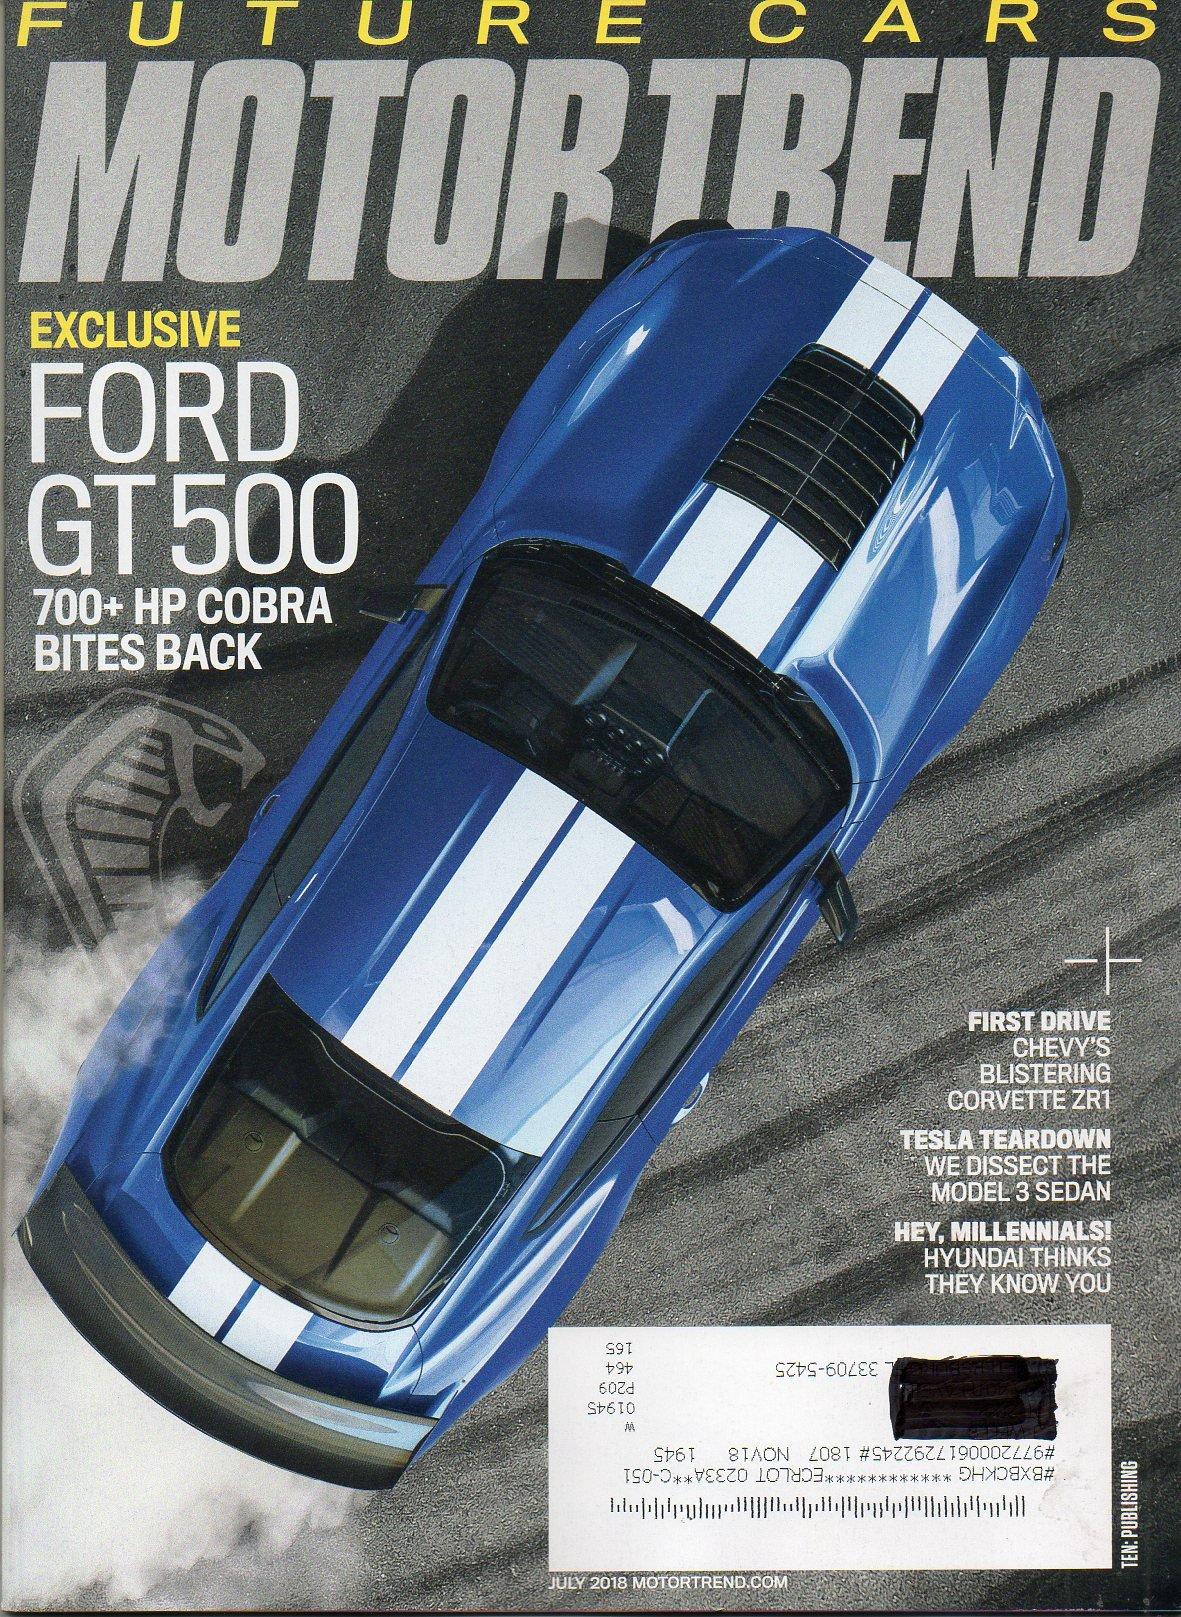 FUTURE CARS BEYOND 2018 Reinventing The Wheel ATESLA TEARDOWN: WE DISSECT THE MODEL 3 SEDAN Motor Trend First Drive CHEVY'S BLISTERING CORVETTE ZR1 John Drafcik Interview CEO Waymo pdf